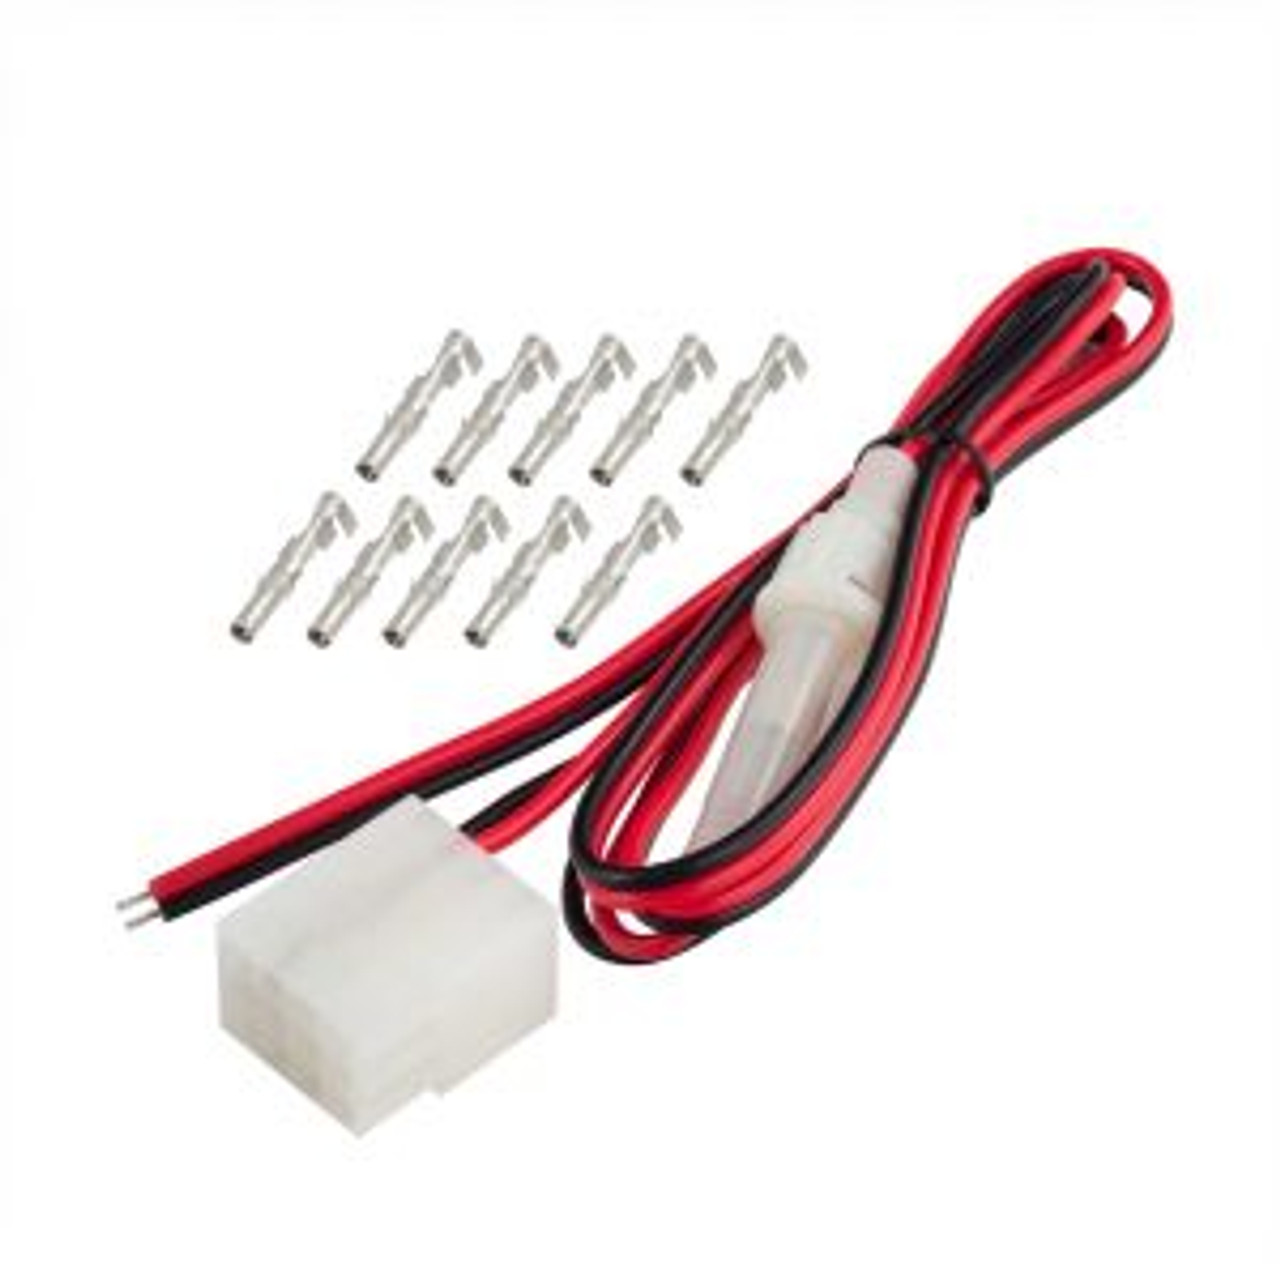 Terratrip Wiring Kit & fuse